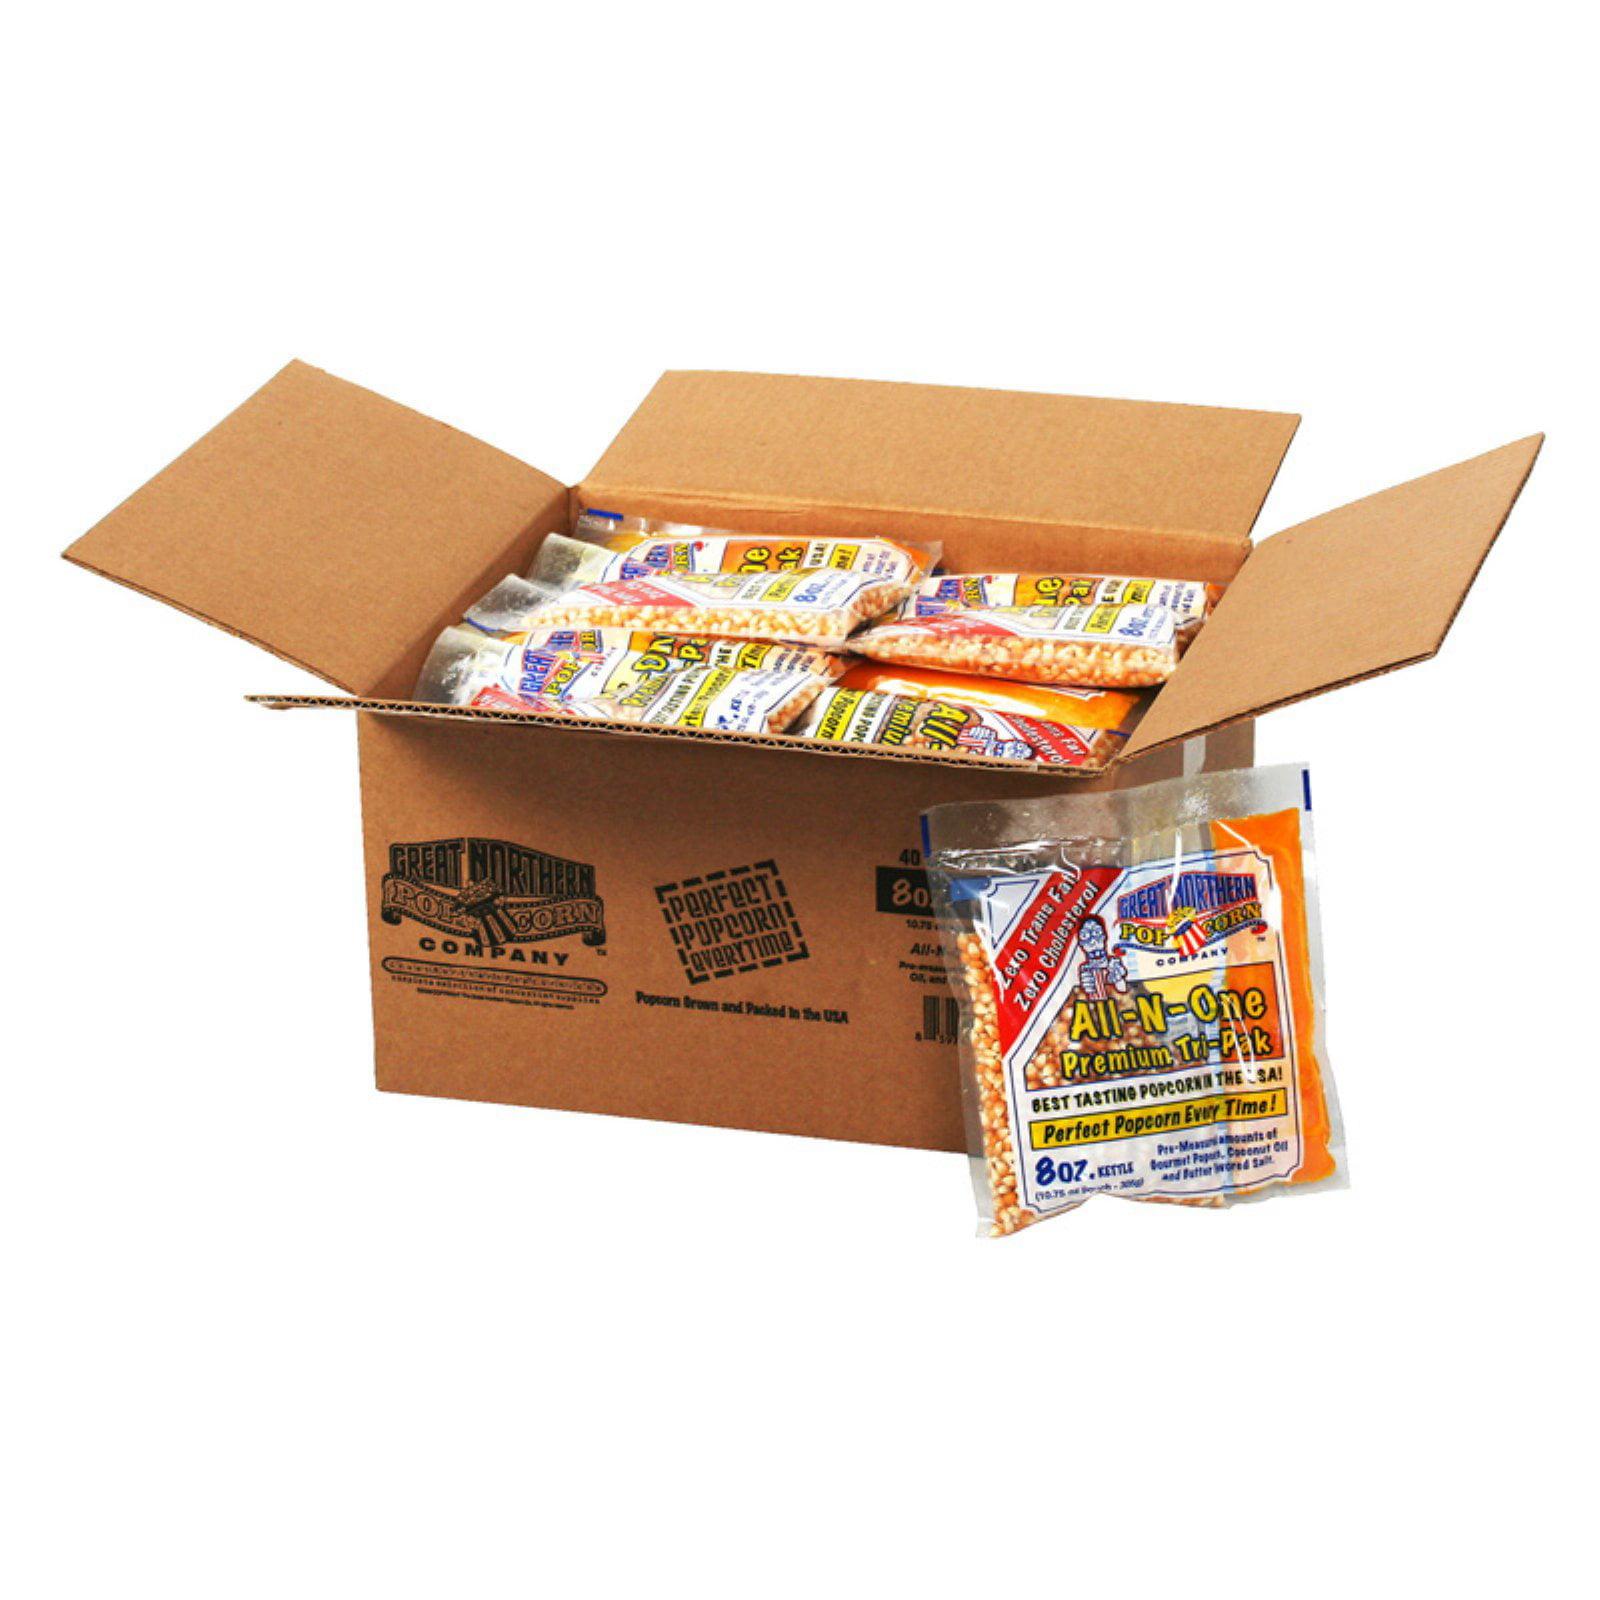 Great Northern Popcorn 8 oz. Popcorn Portion Packs - Case of 40